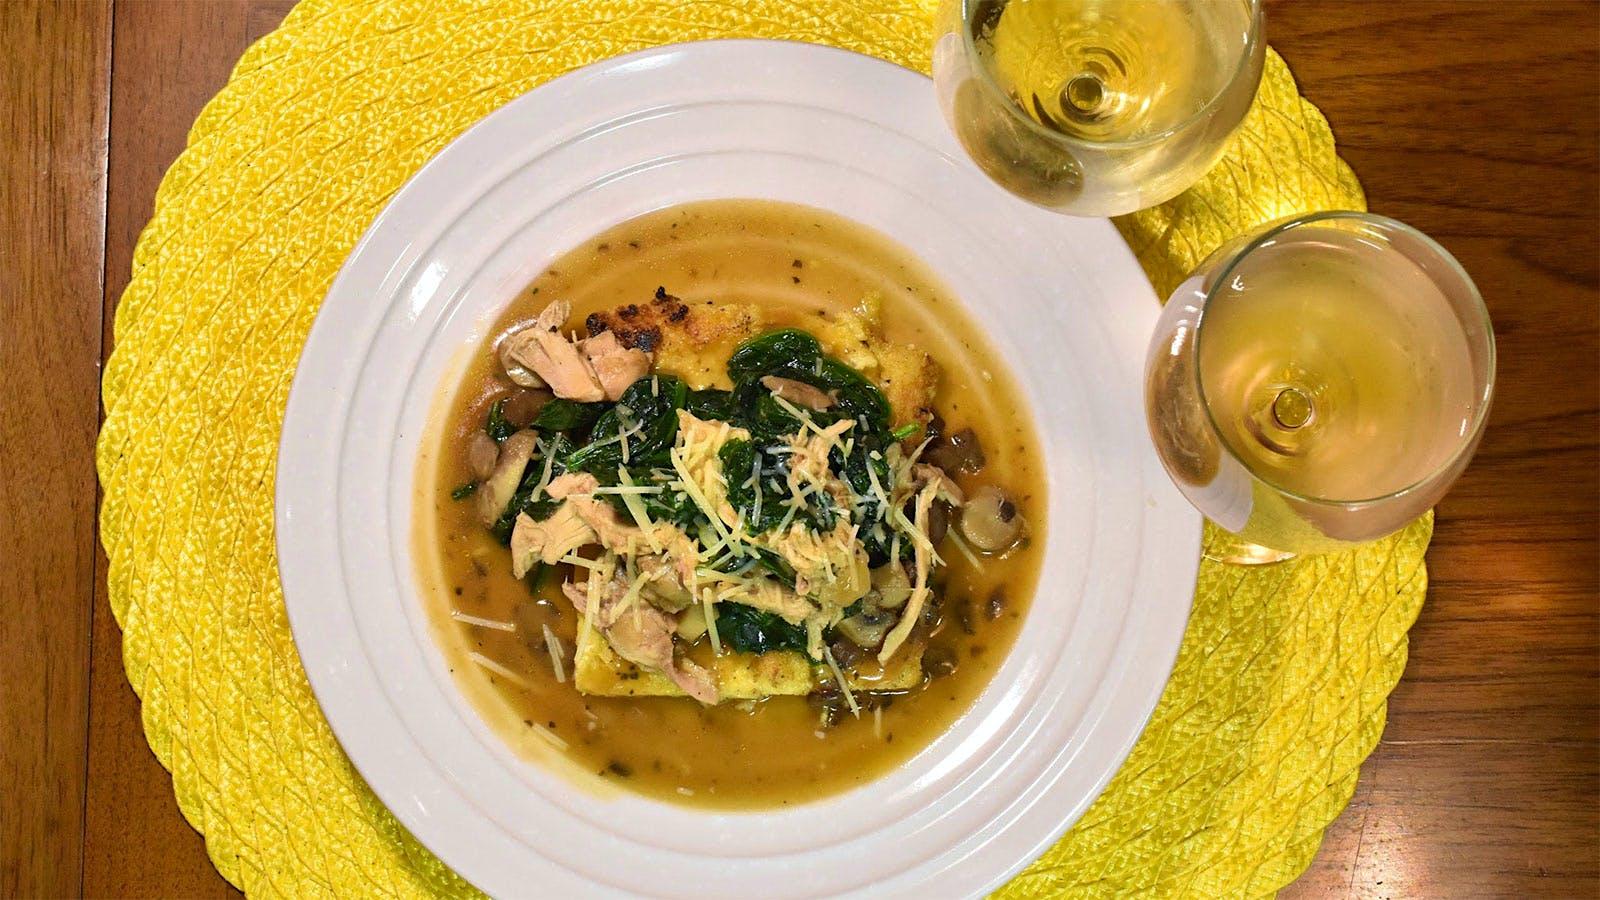 8 & $20: Crispy Polenta with Chicken and Vegetable Sauté